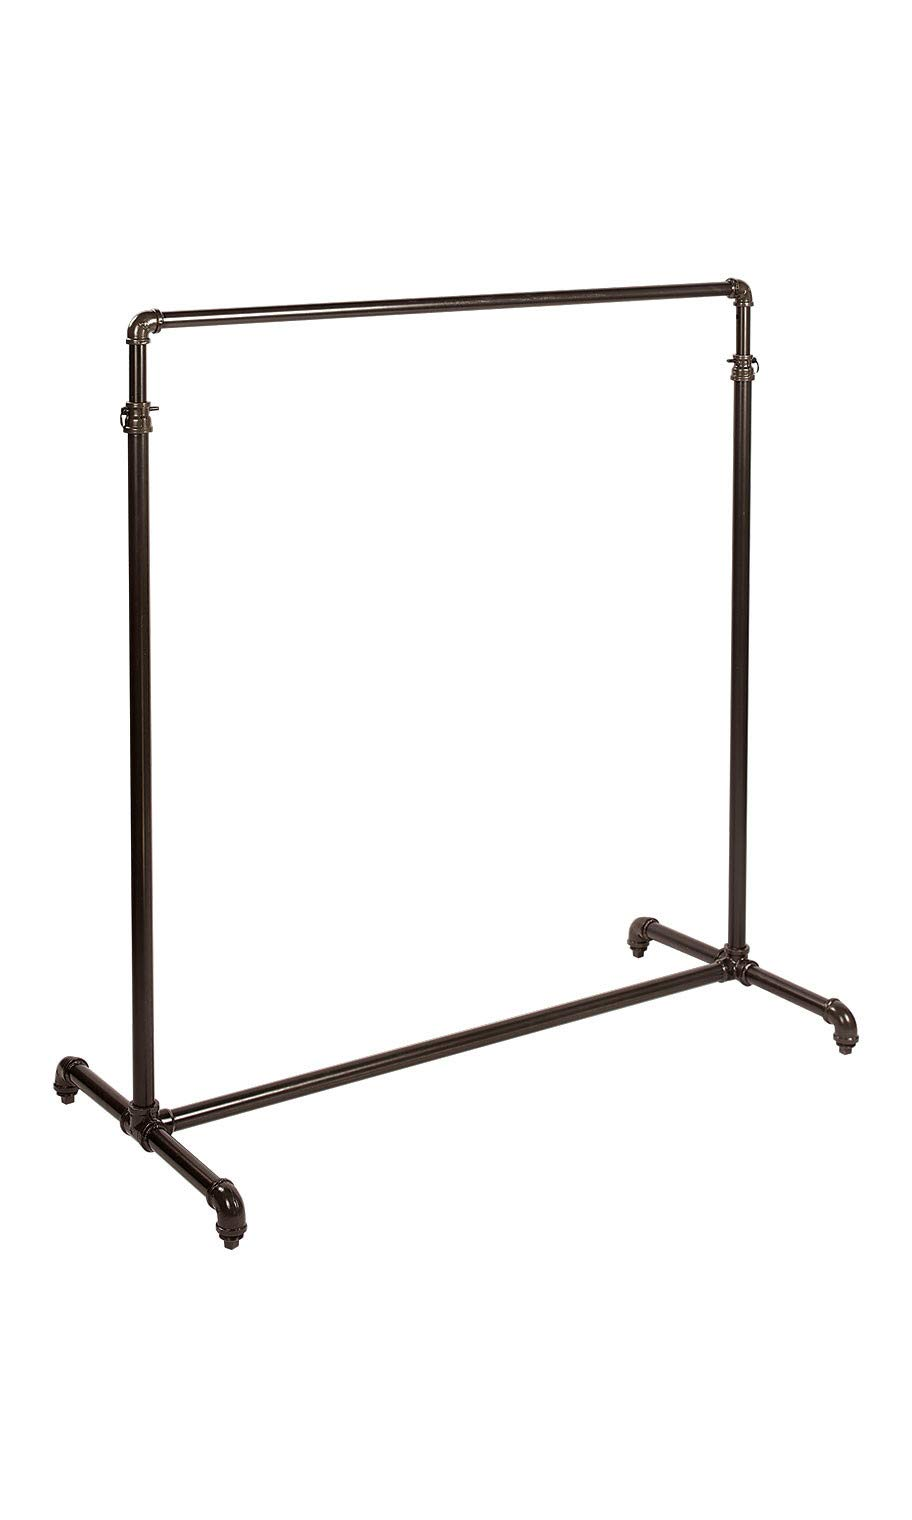 Retails Single Rail Ballet Bar Clothing Display Rack 48'' W x 23½�D x 48''-72'' H